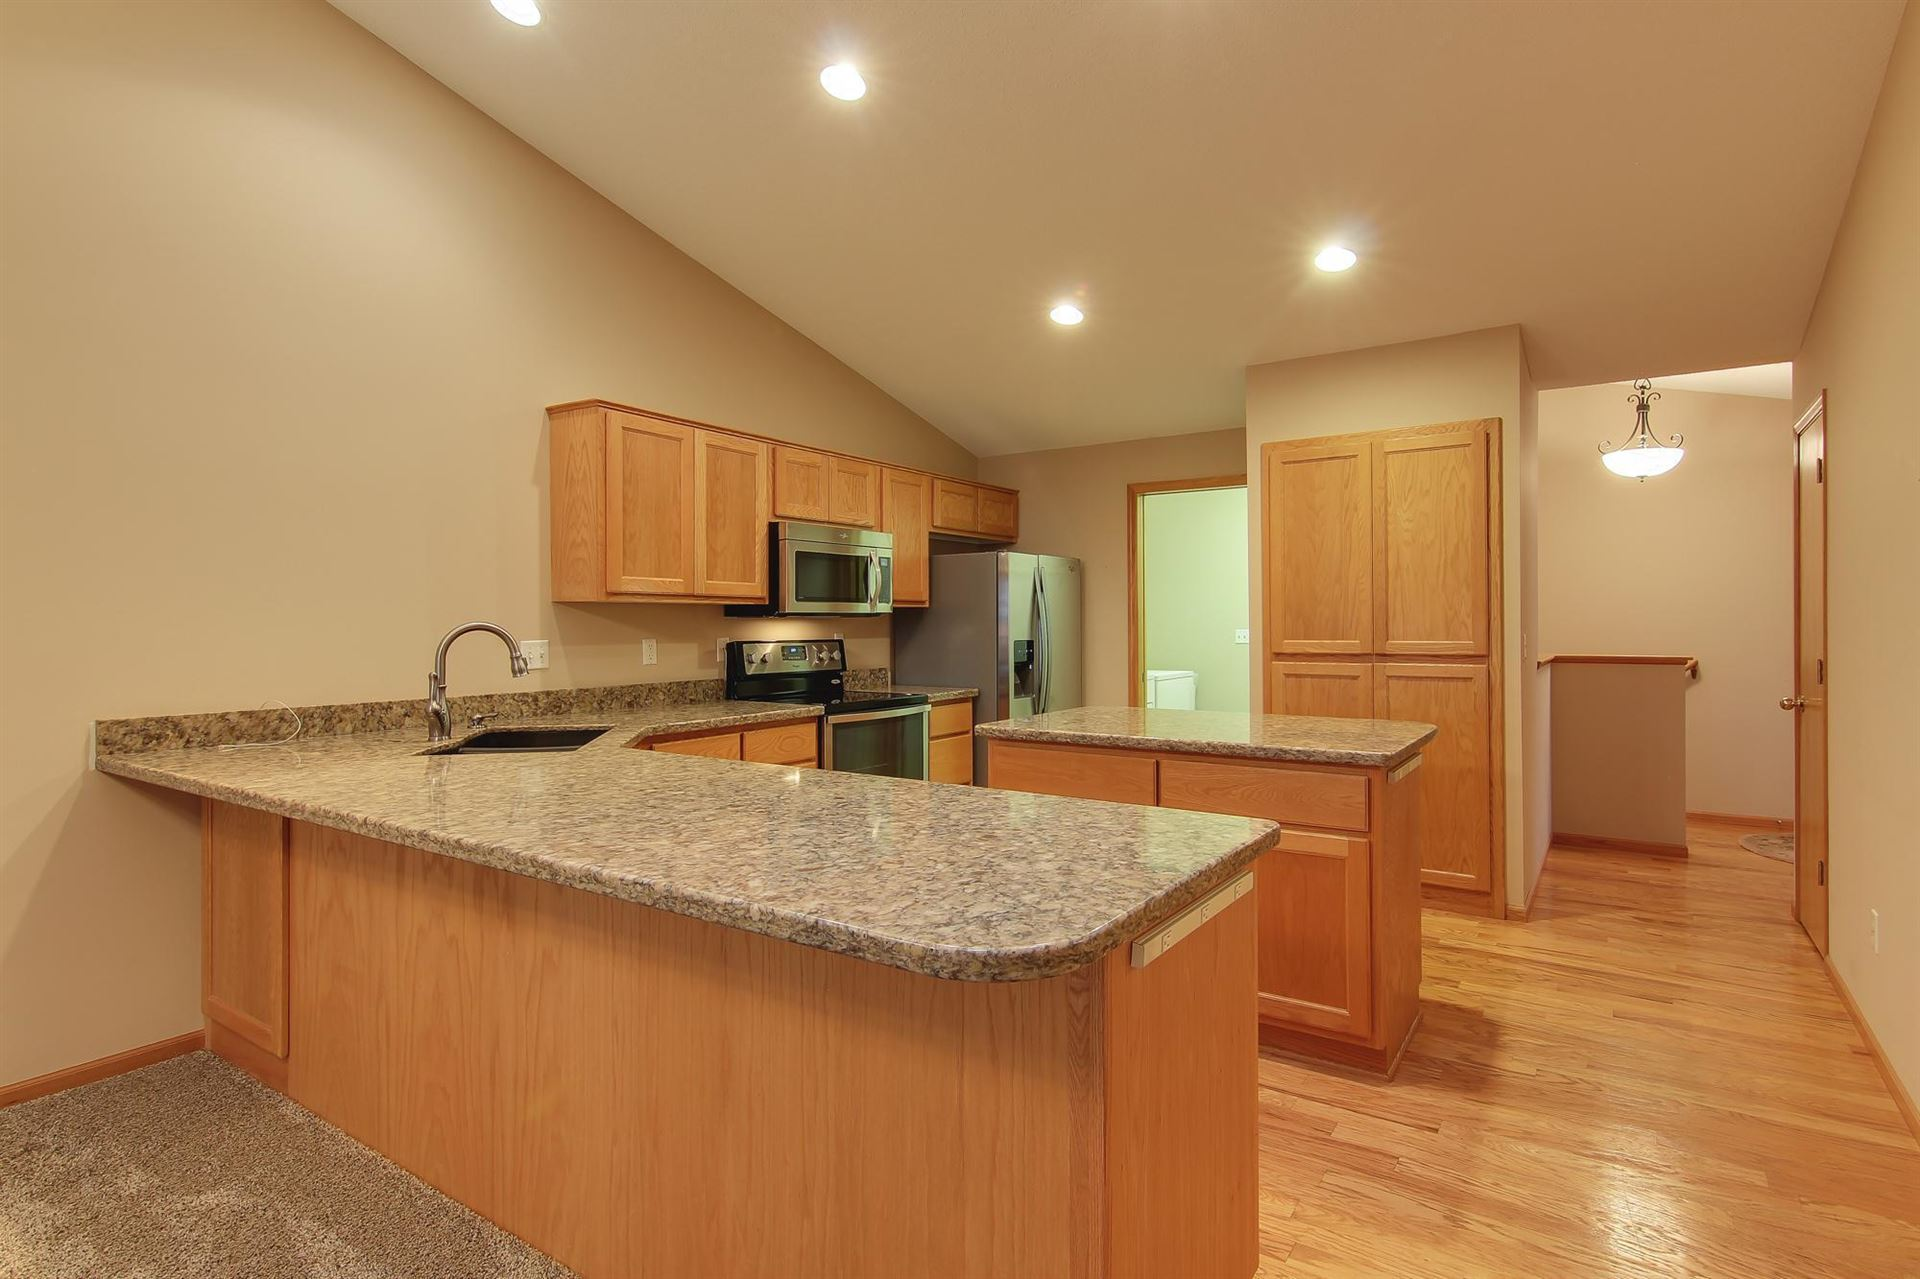 Photo of 14228 Heritage Lane, Apple Valley, MN 55124 (MLS # 5695033)